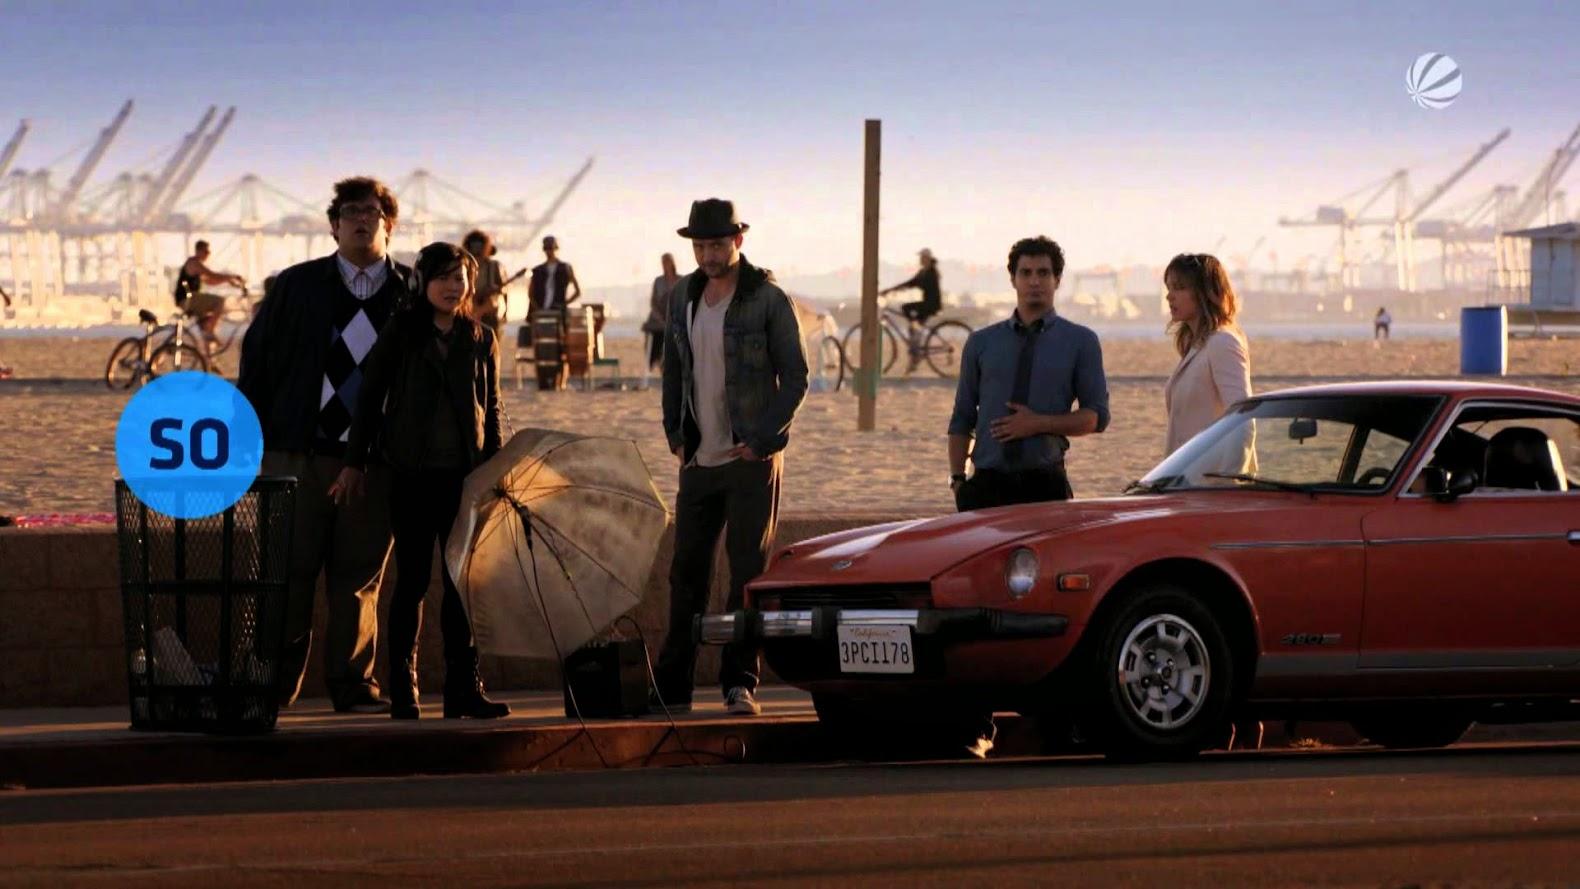 Bọ Cạp (Phần 1) - Scorpion Season 1